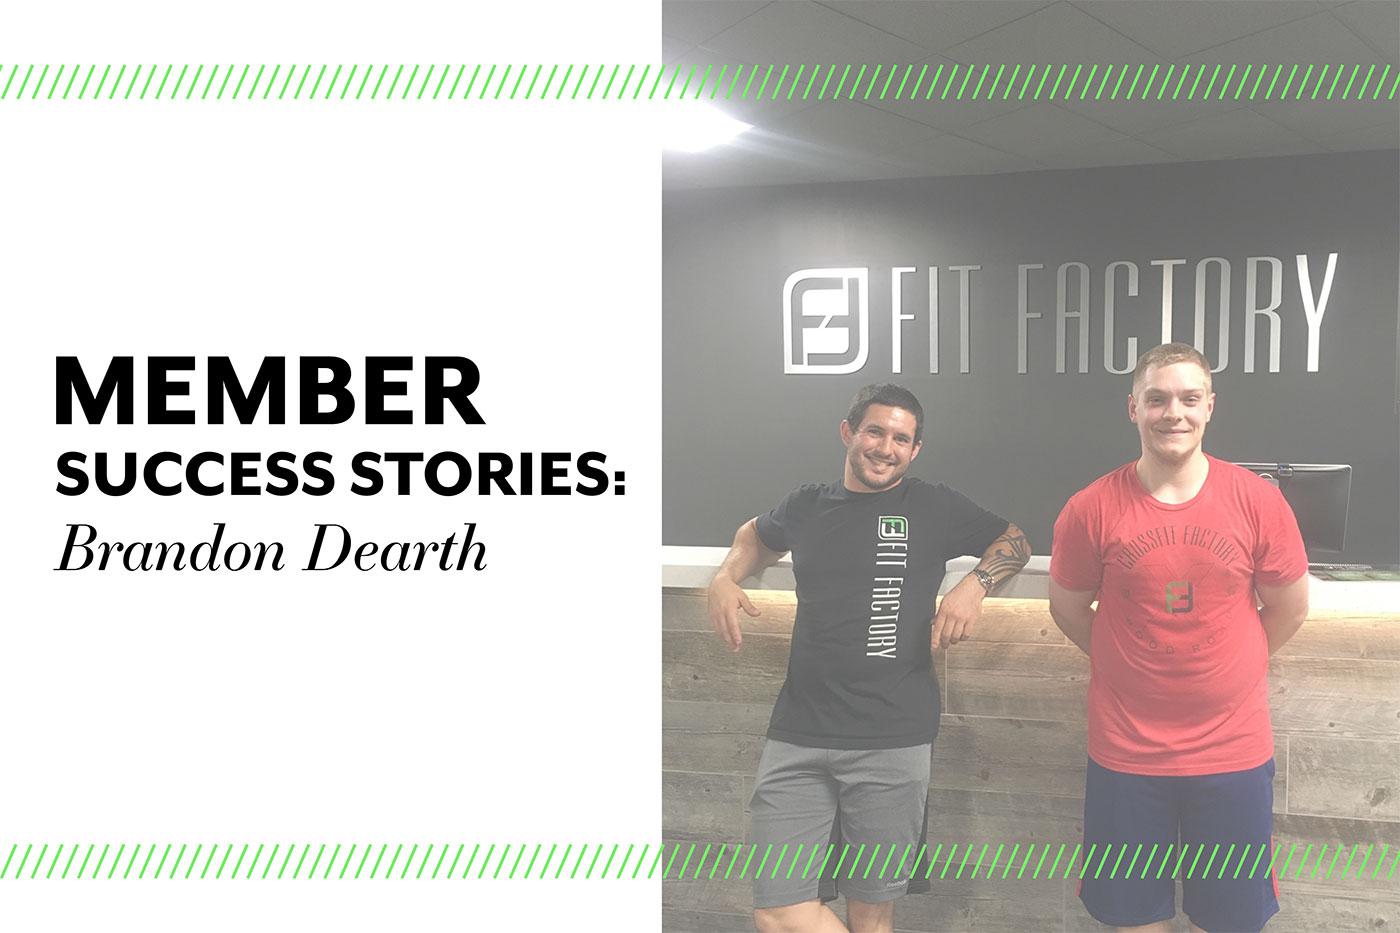 Member Success Story: Brandon Dearth